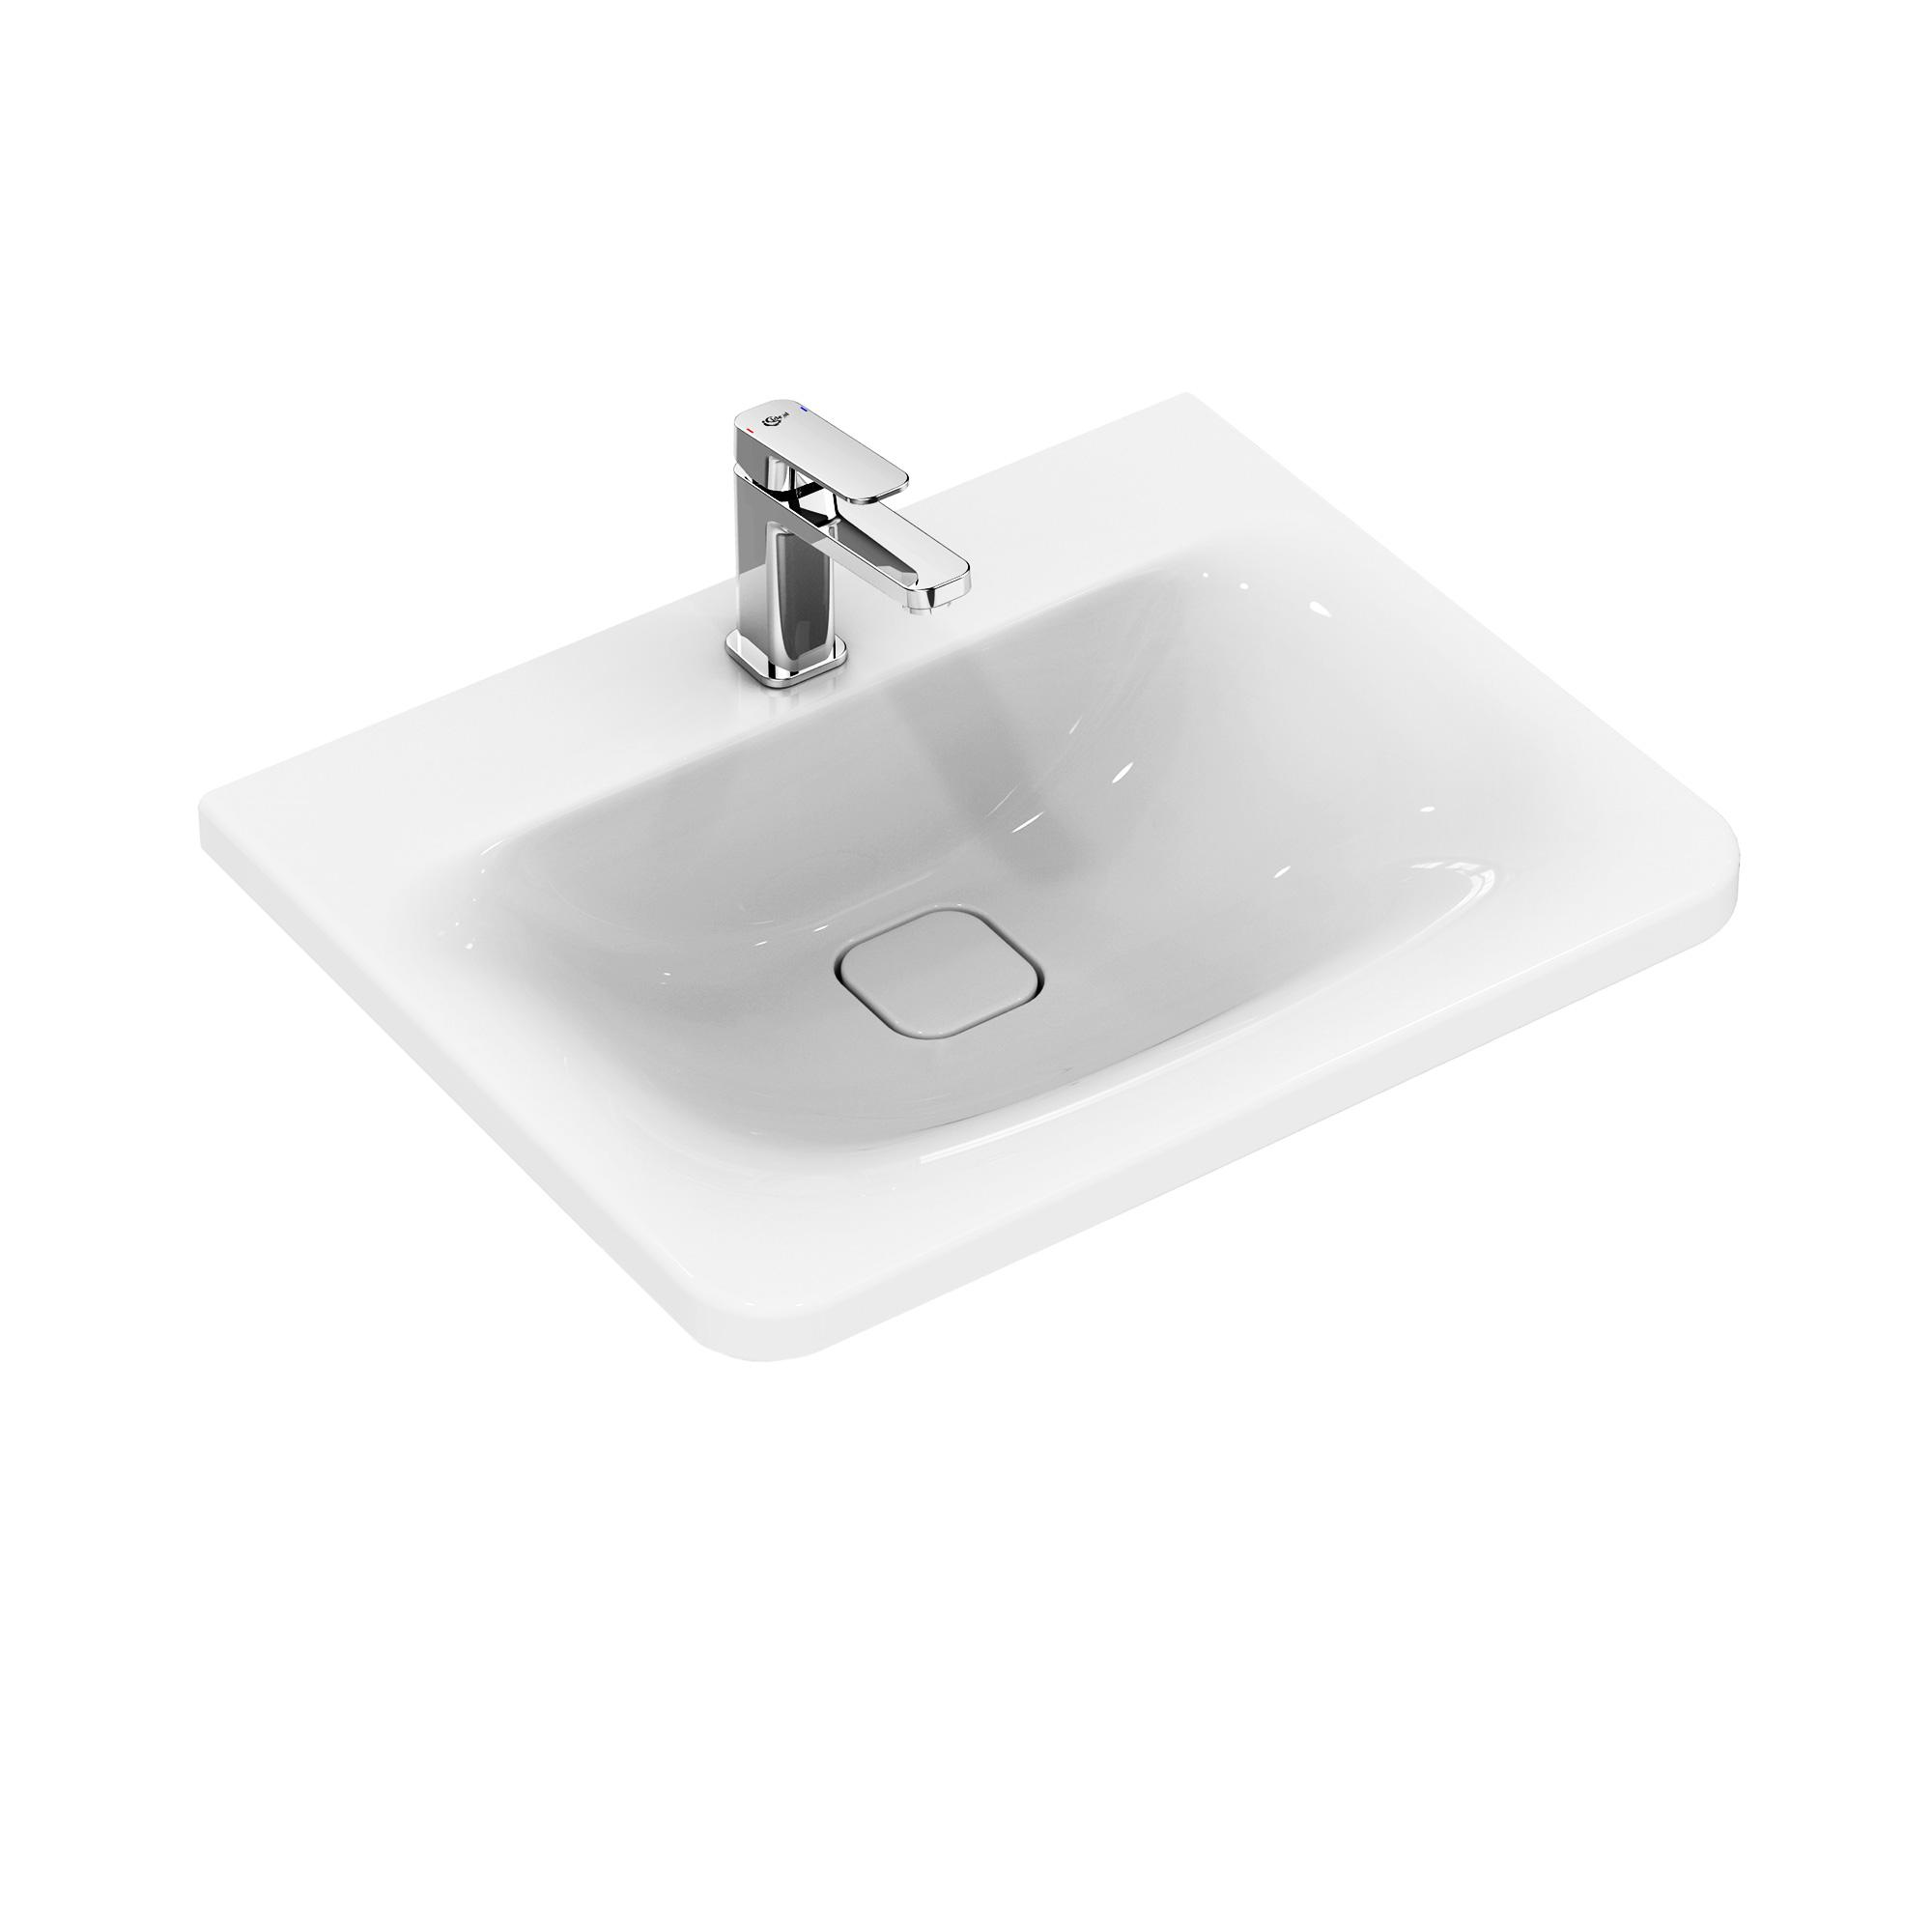 ideal standard waschtisch ideal standard waschtisch. Black Bedroom Furniture Sets. Home Design Ideas